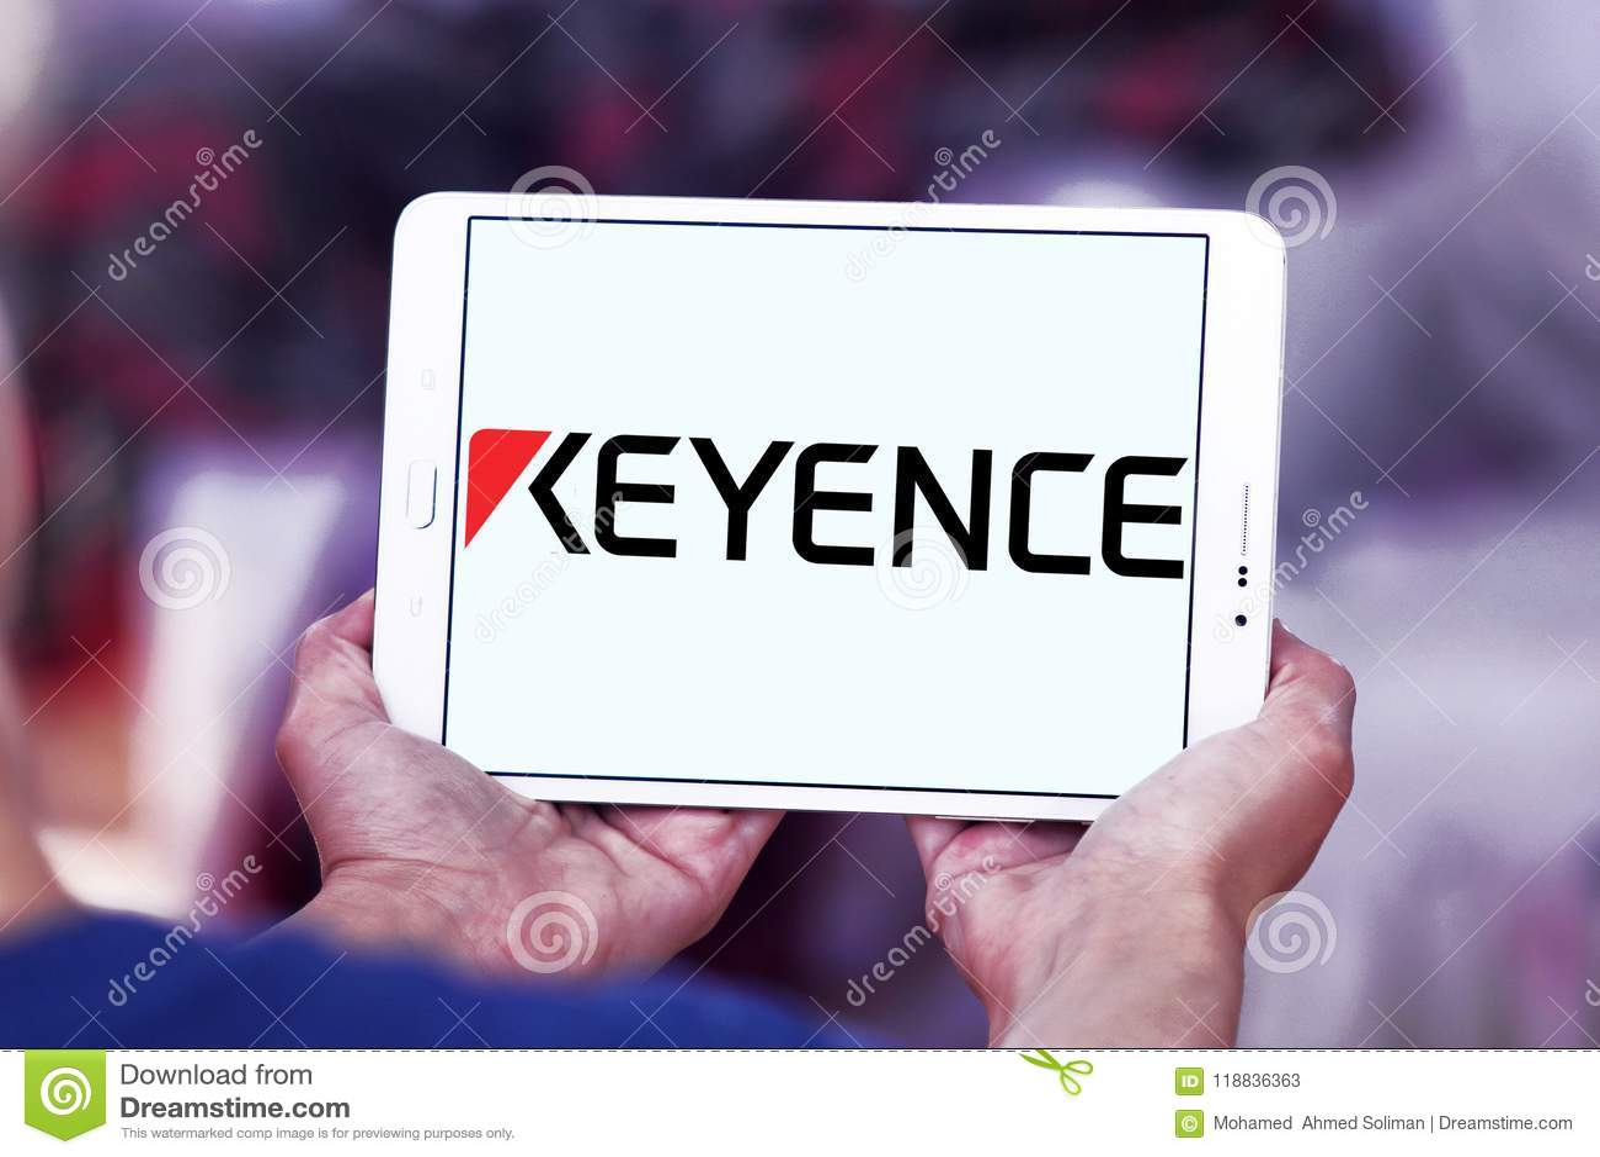 Keyence Corporation logo editorial stock photo  Image of